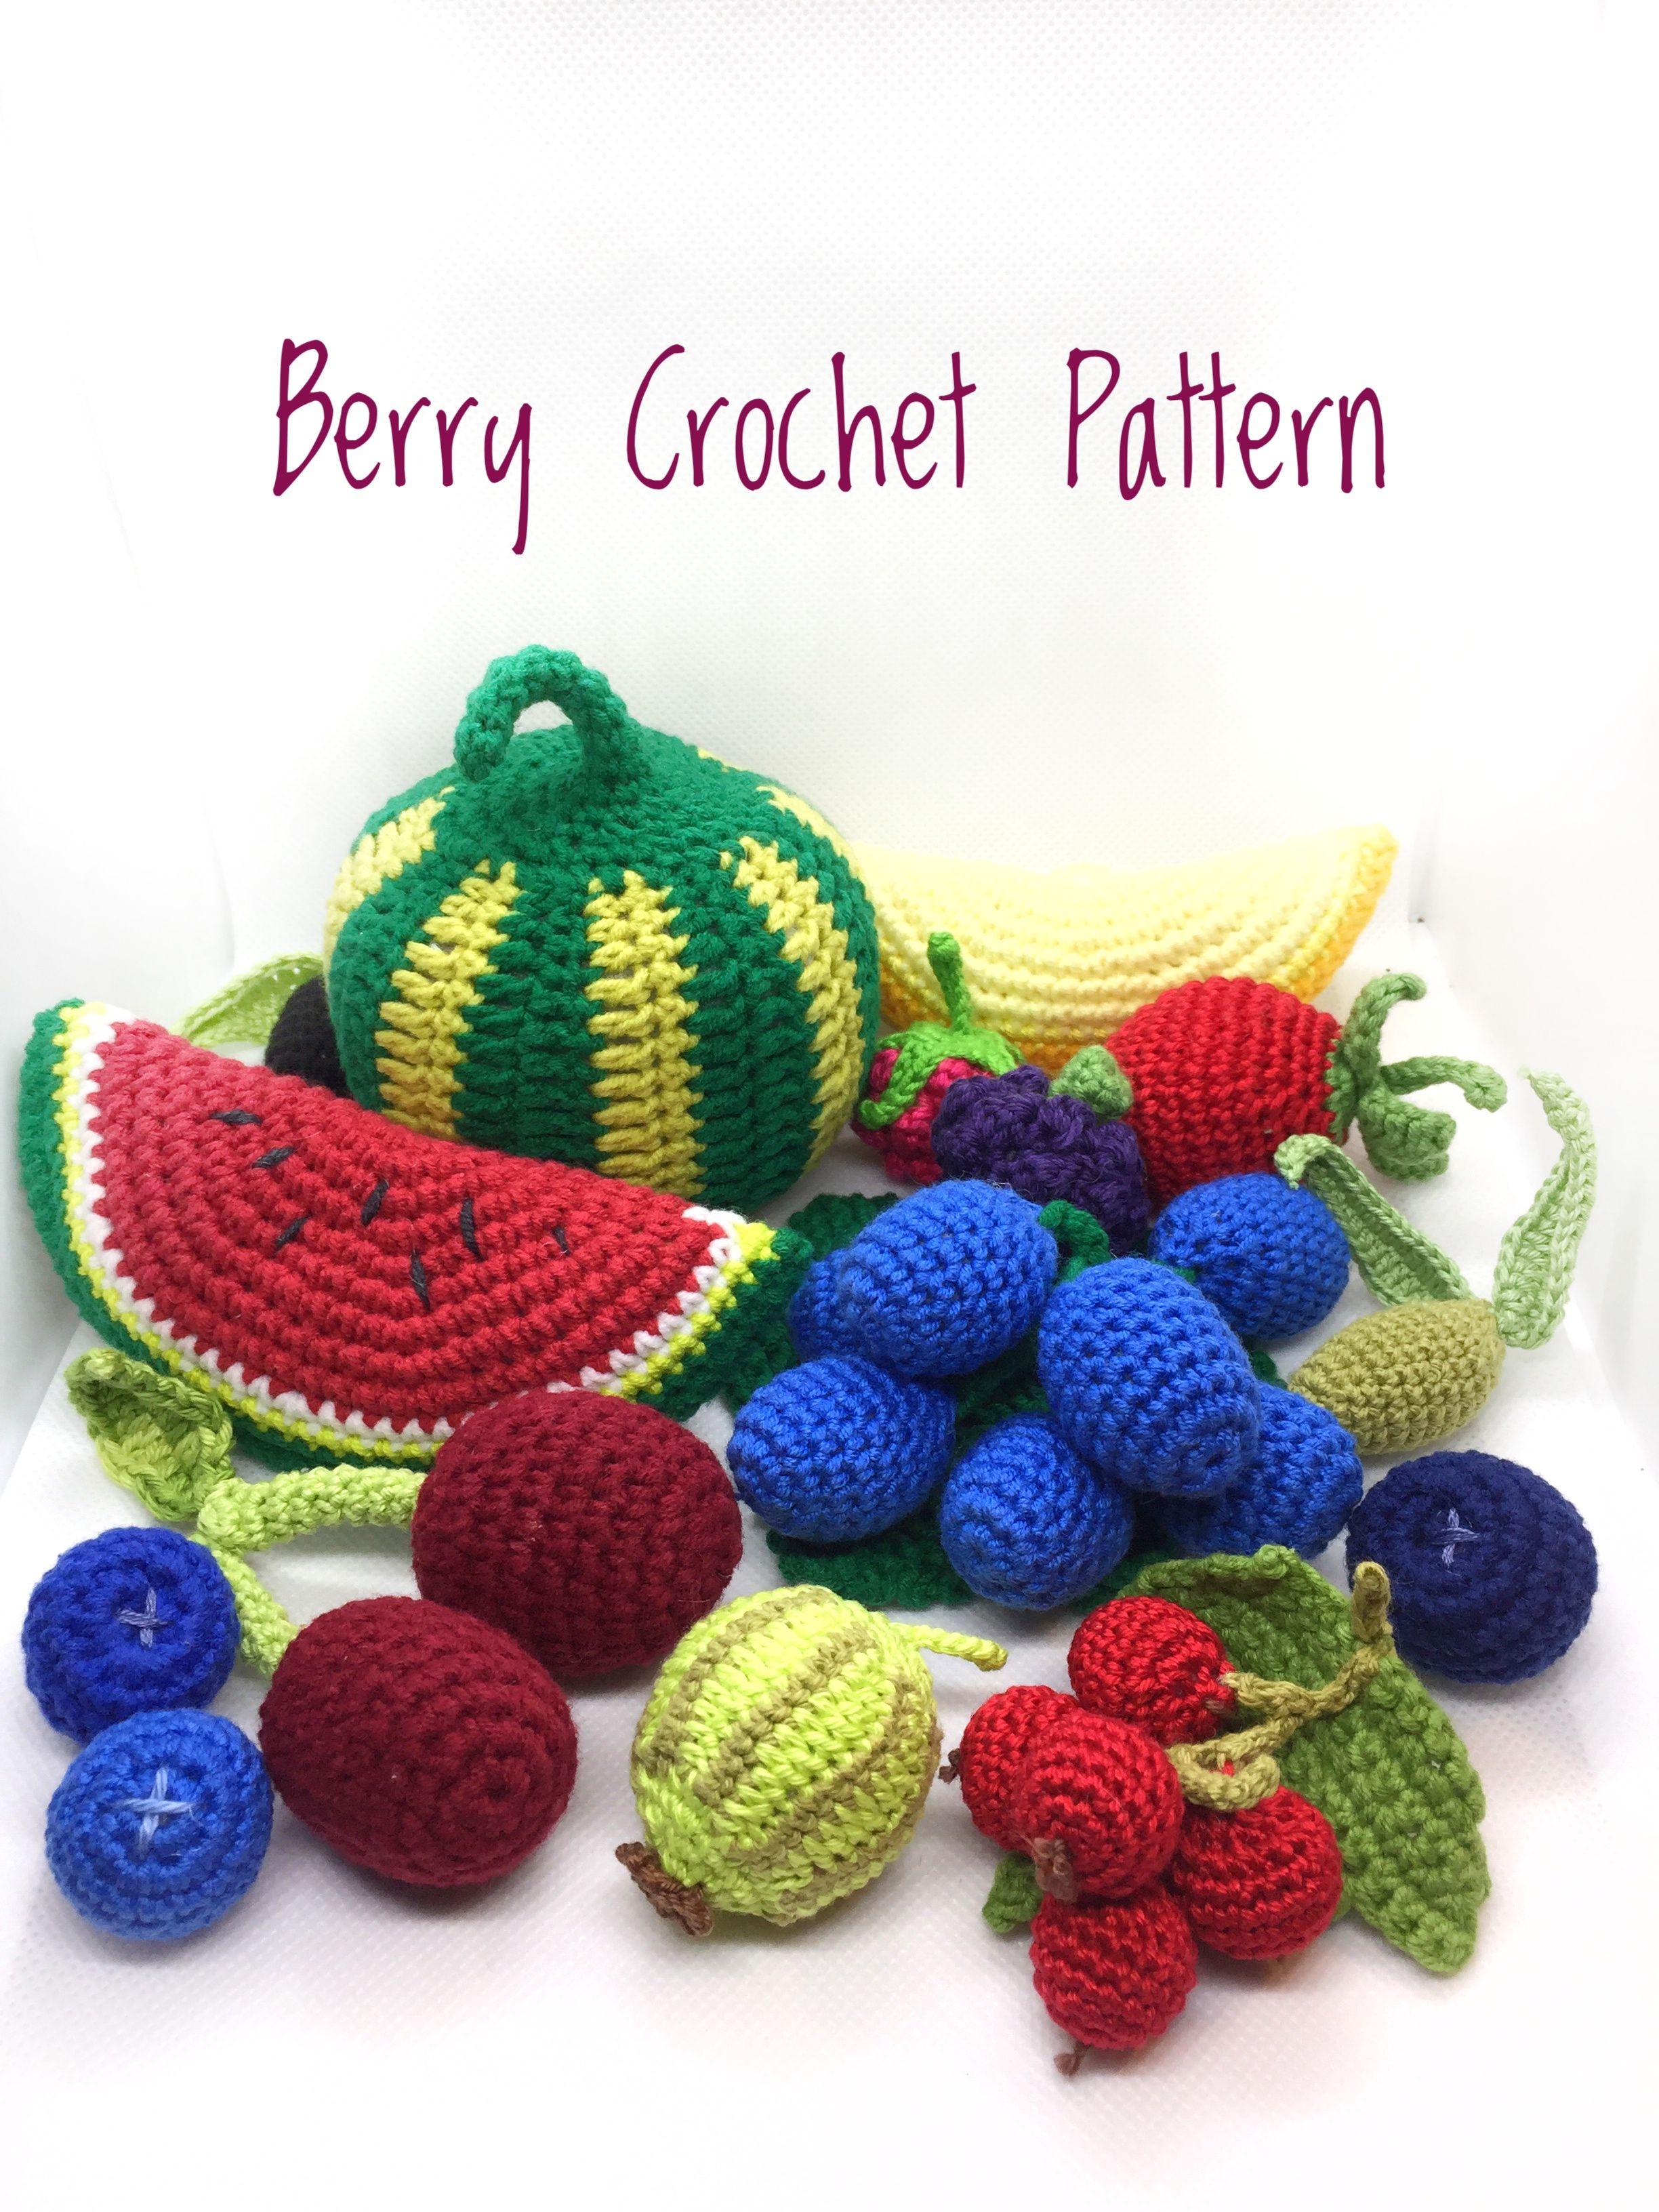 Cherry Crochet Pattern Strawberry Crochet Pattern Blueberry